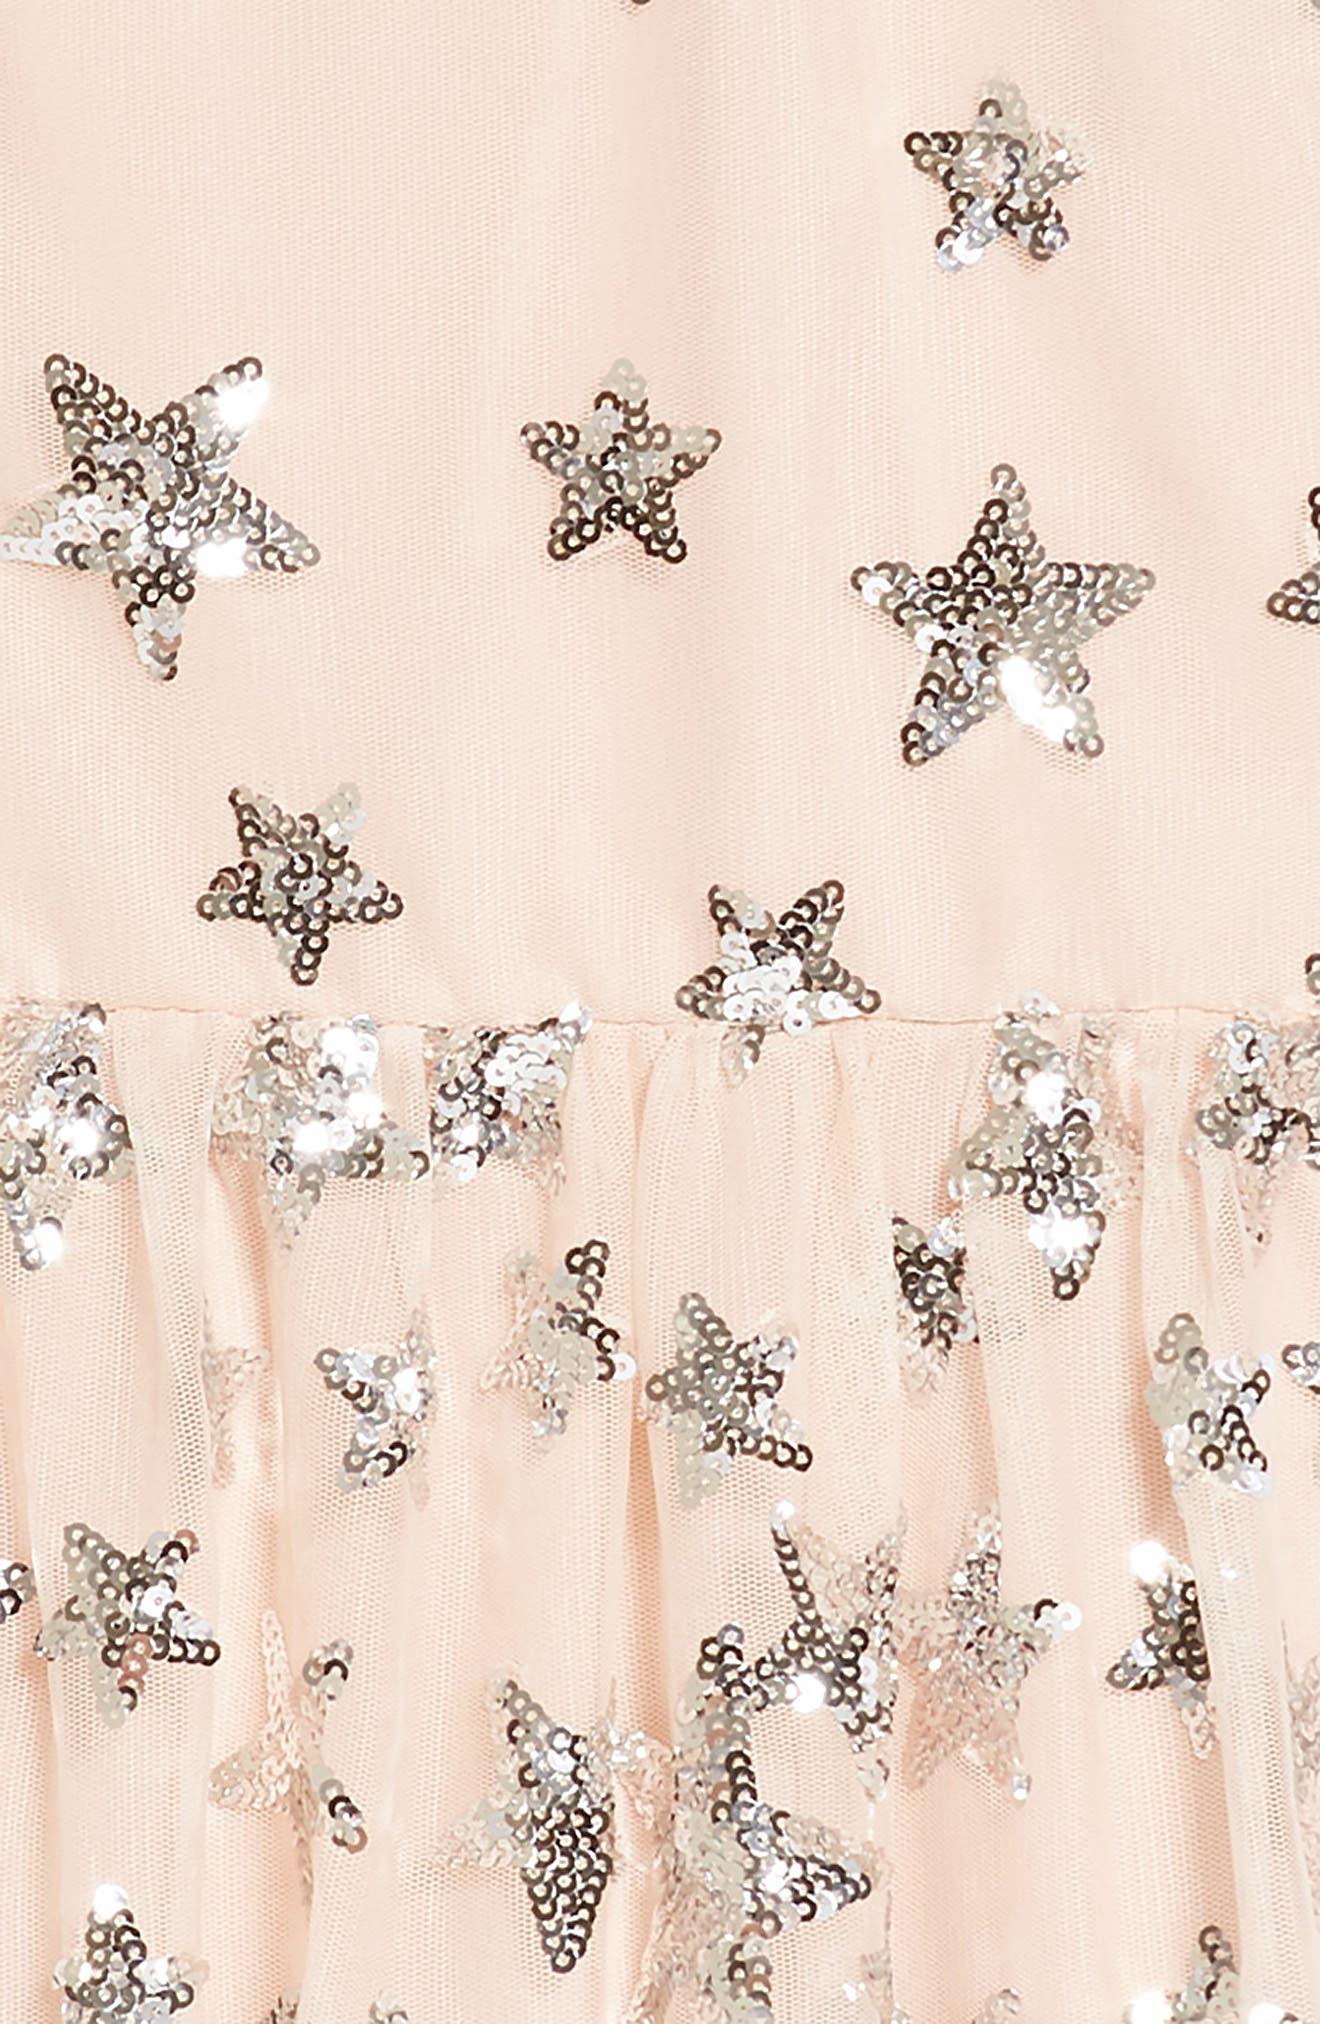 Sequin Embellished Star Party Dress,                             Alternate thumbnail 3, color,                             Blush